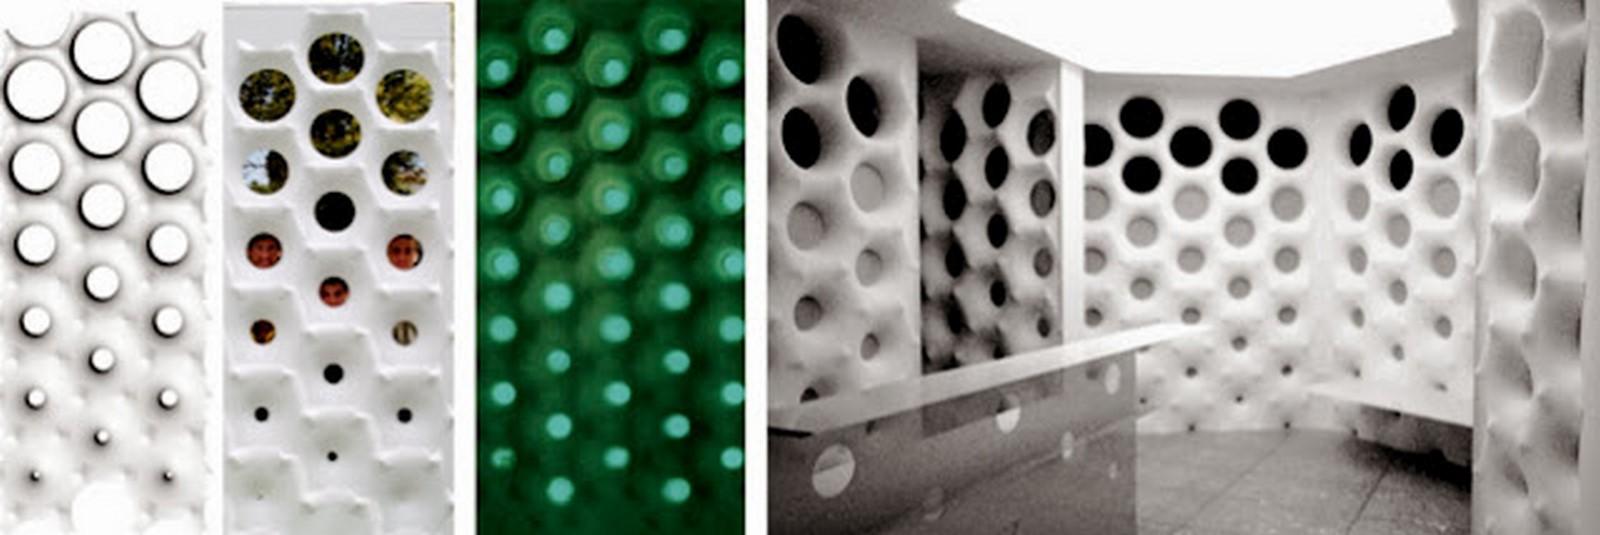 The Future of Architecture: Biodigital Architecture and Genetics - Sheet5